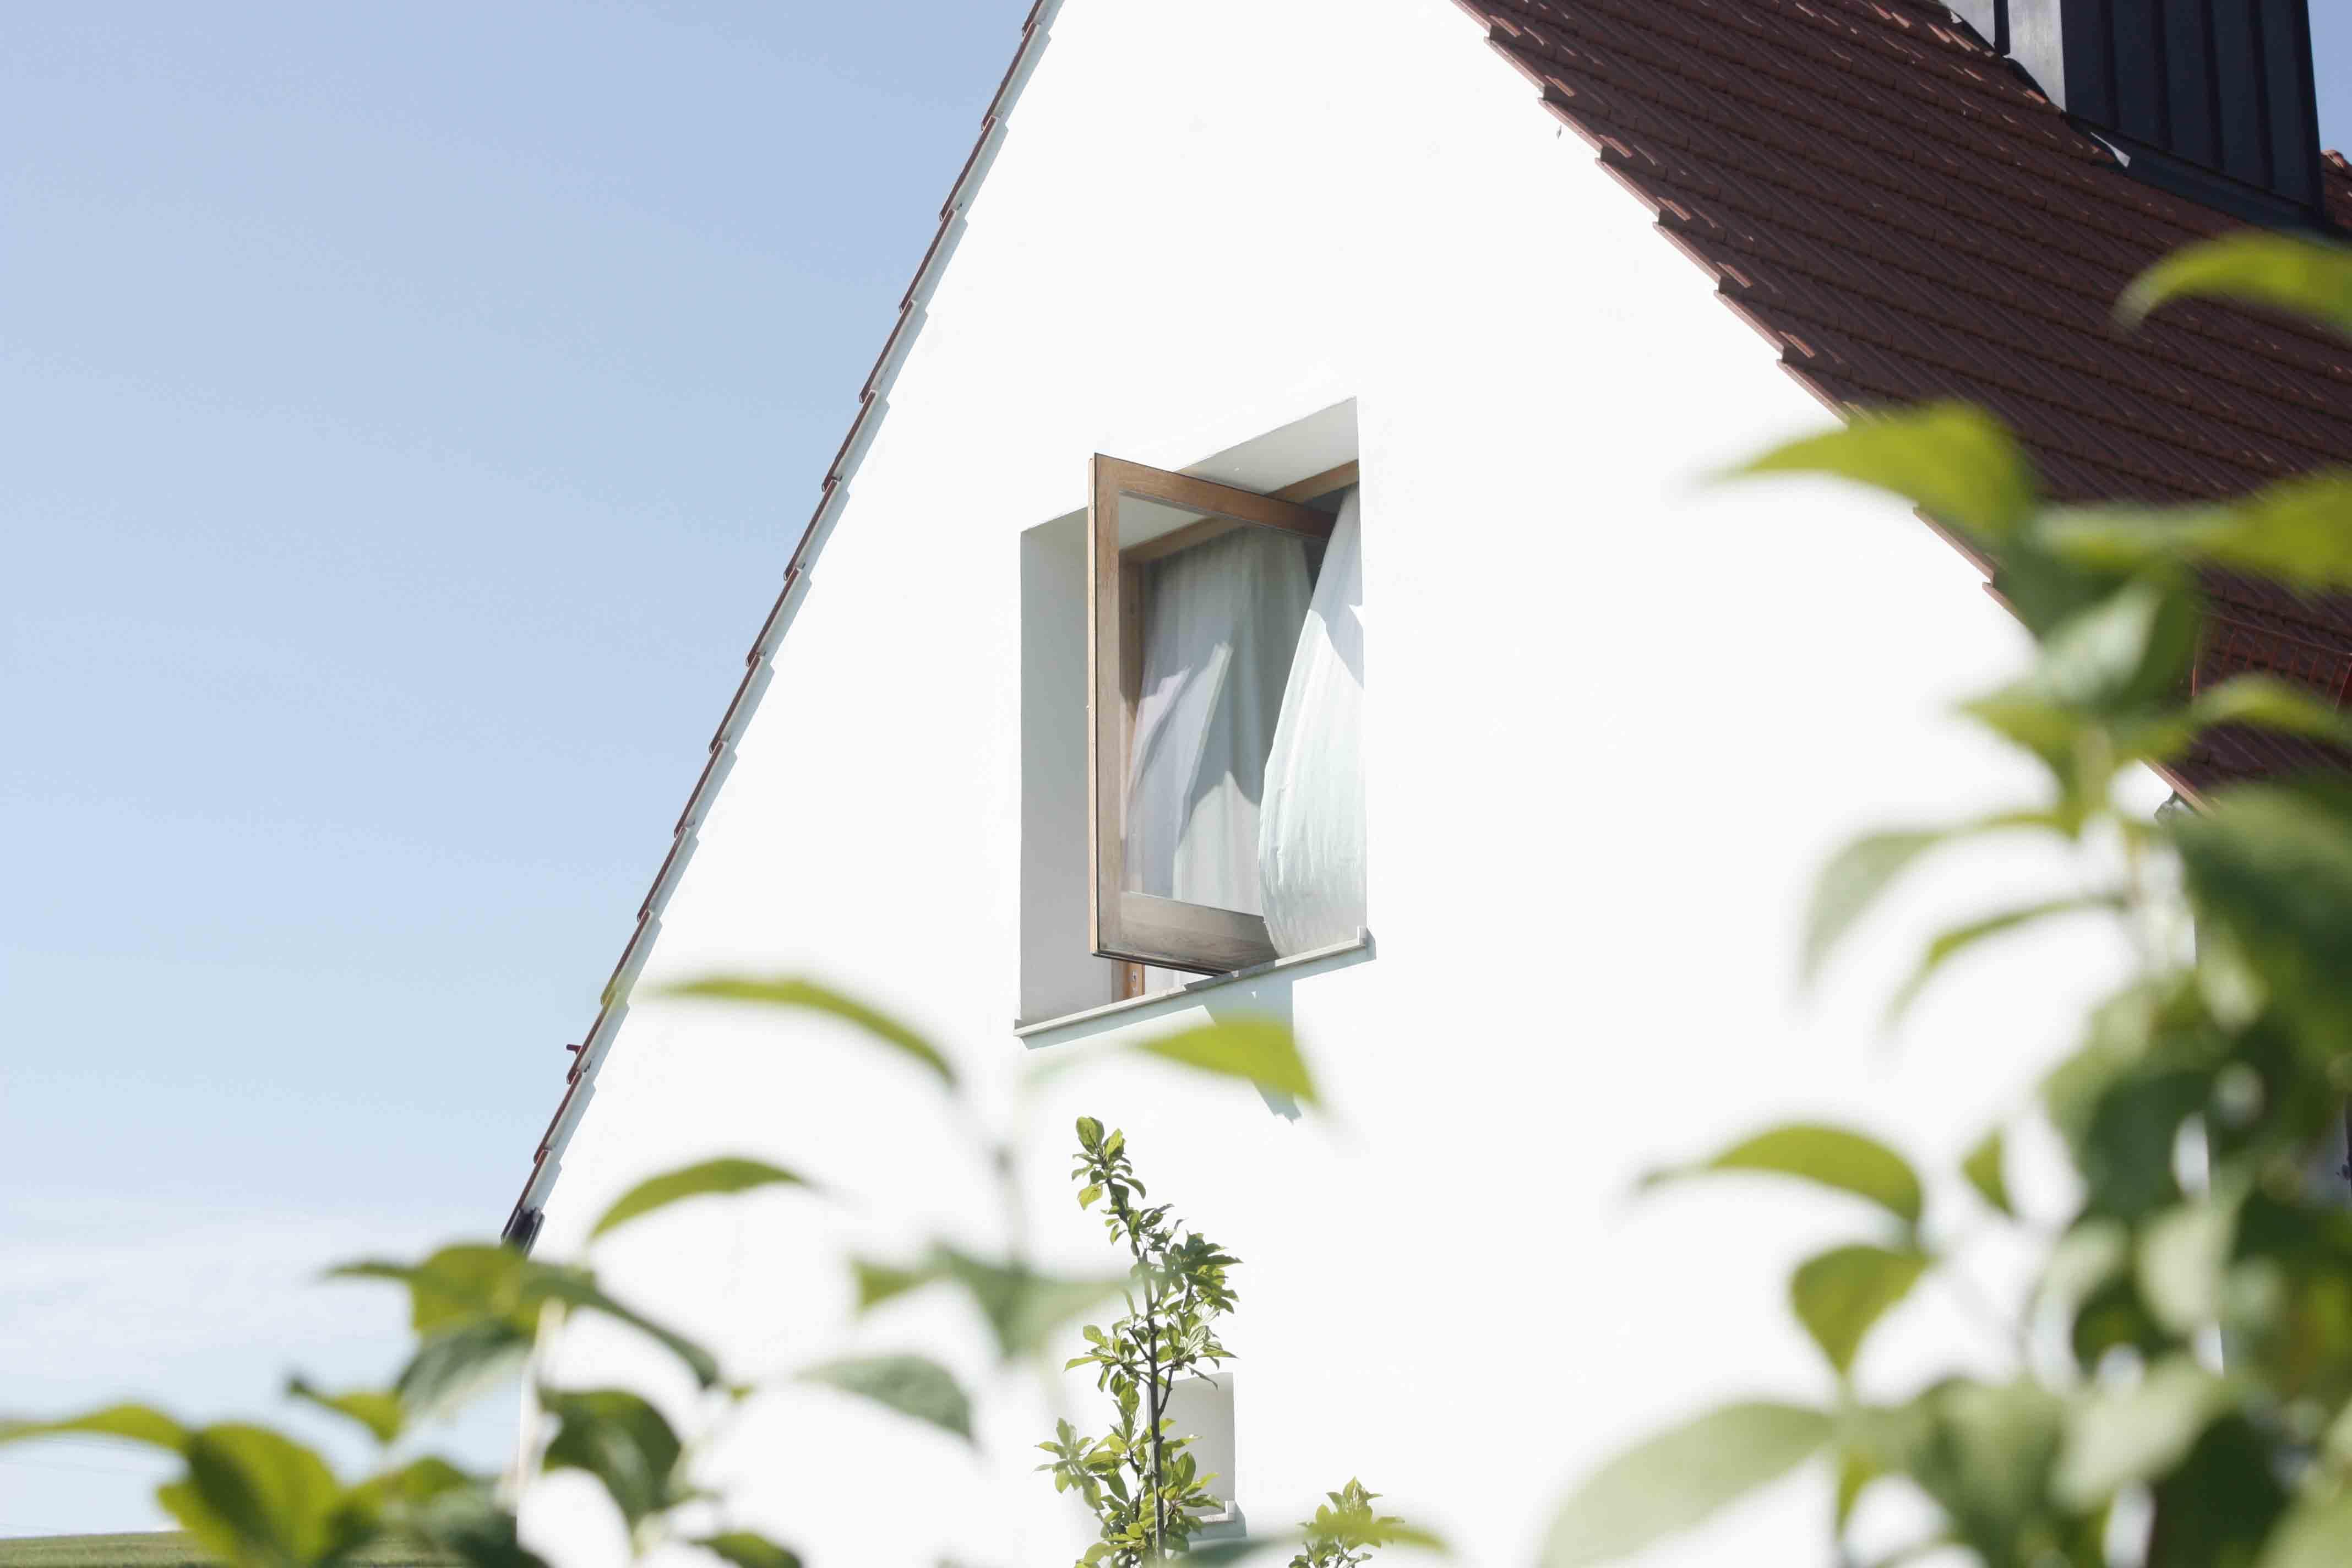 Pivoting window by Mathias Stelmach